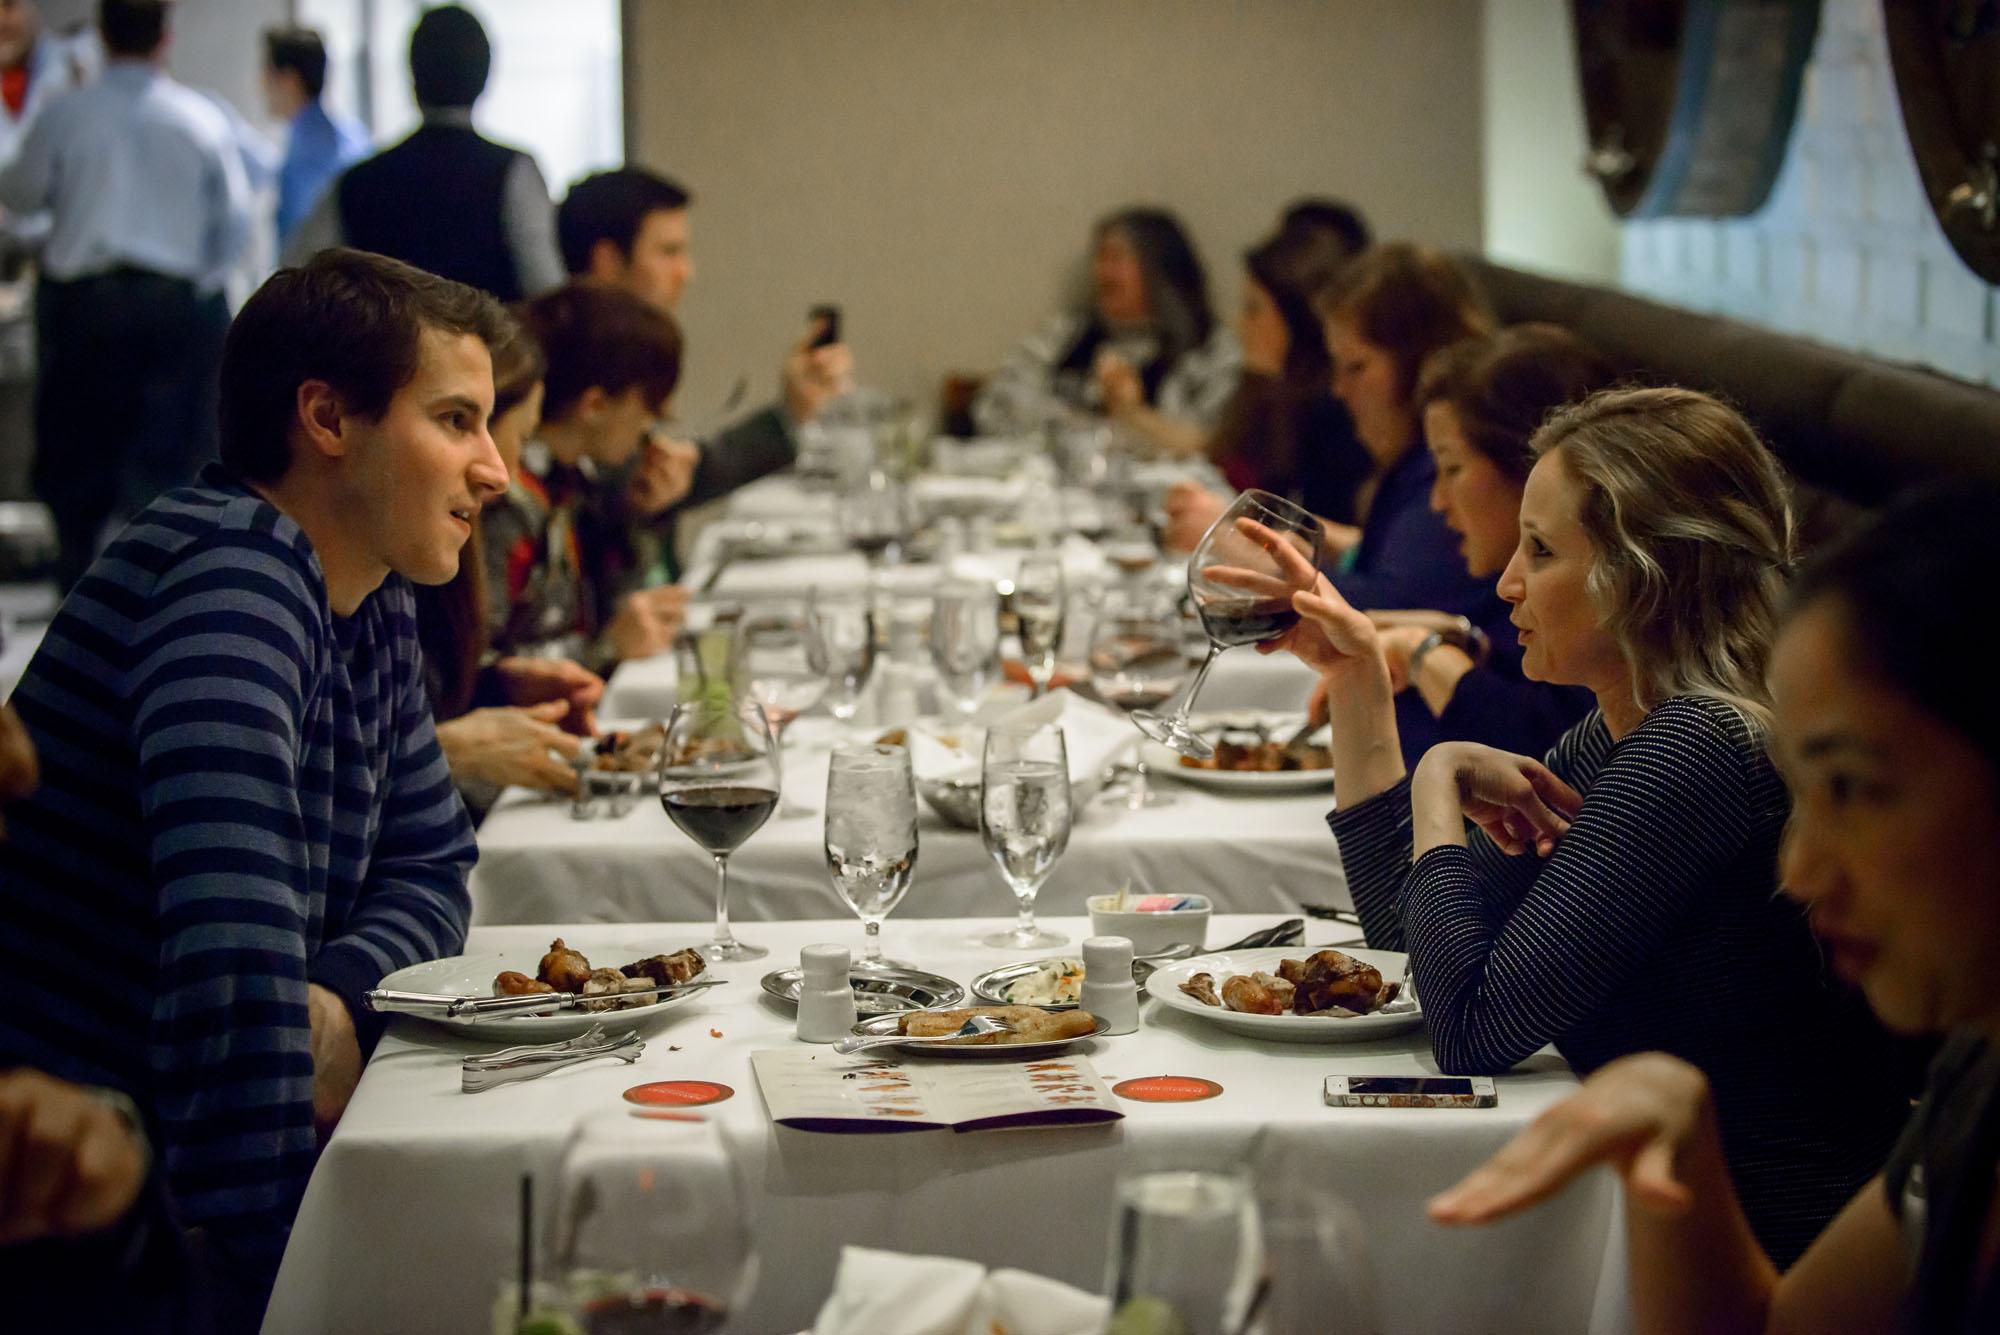 6483_d800b_Fogo_de_Chao_San_Jose_Restaurant_Food_Photography.jpg